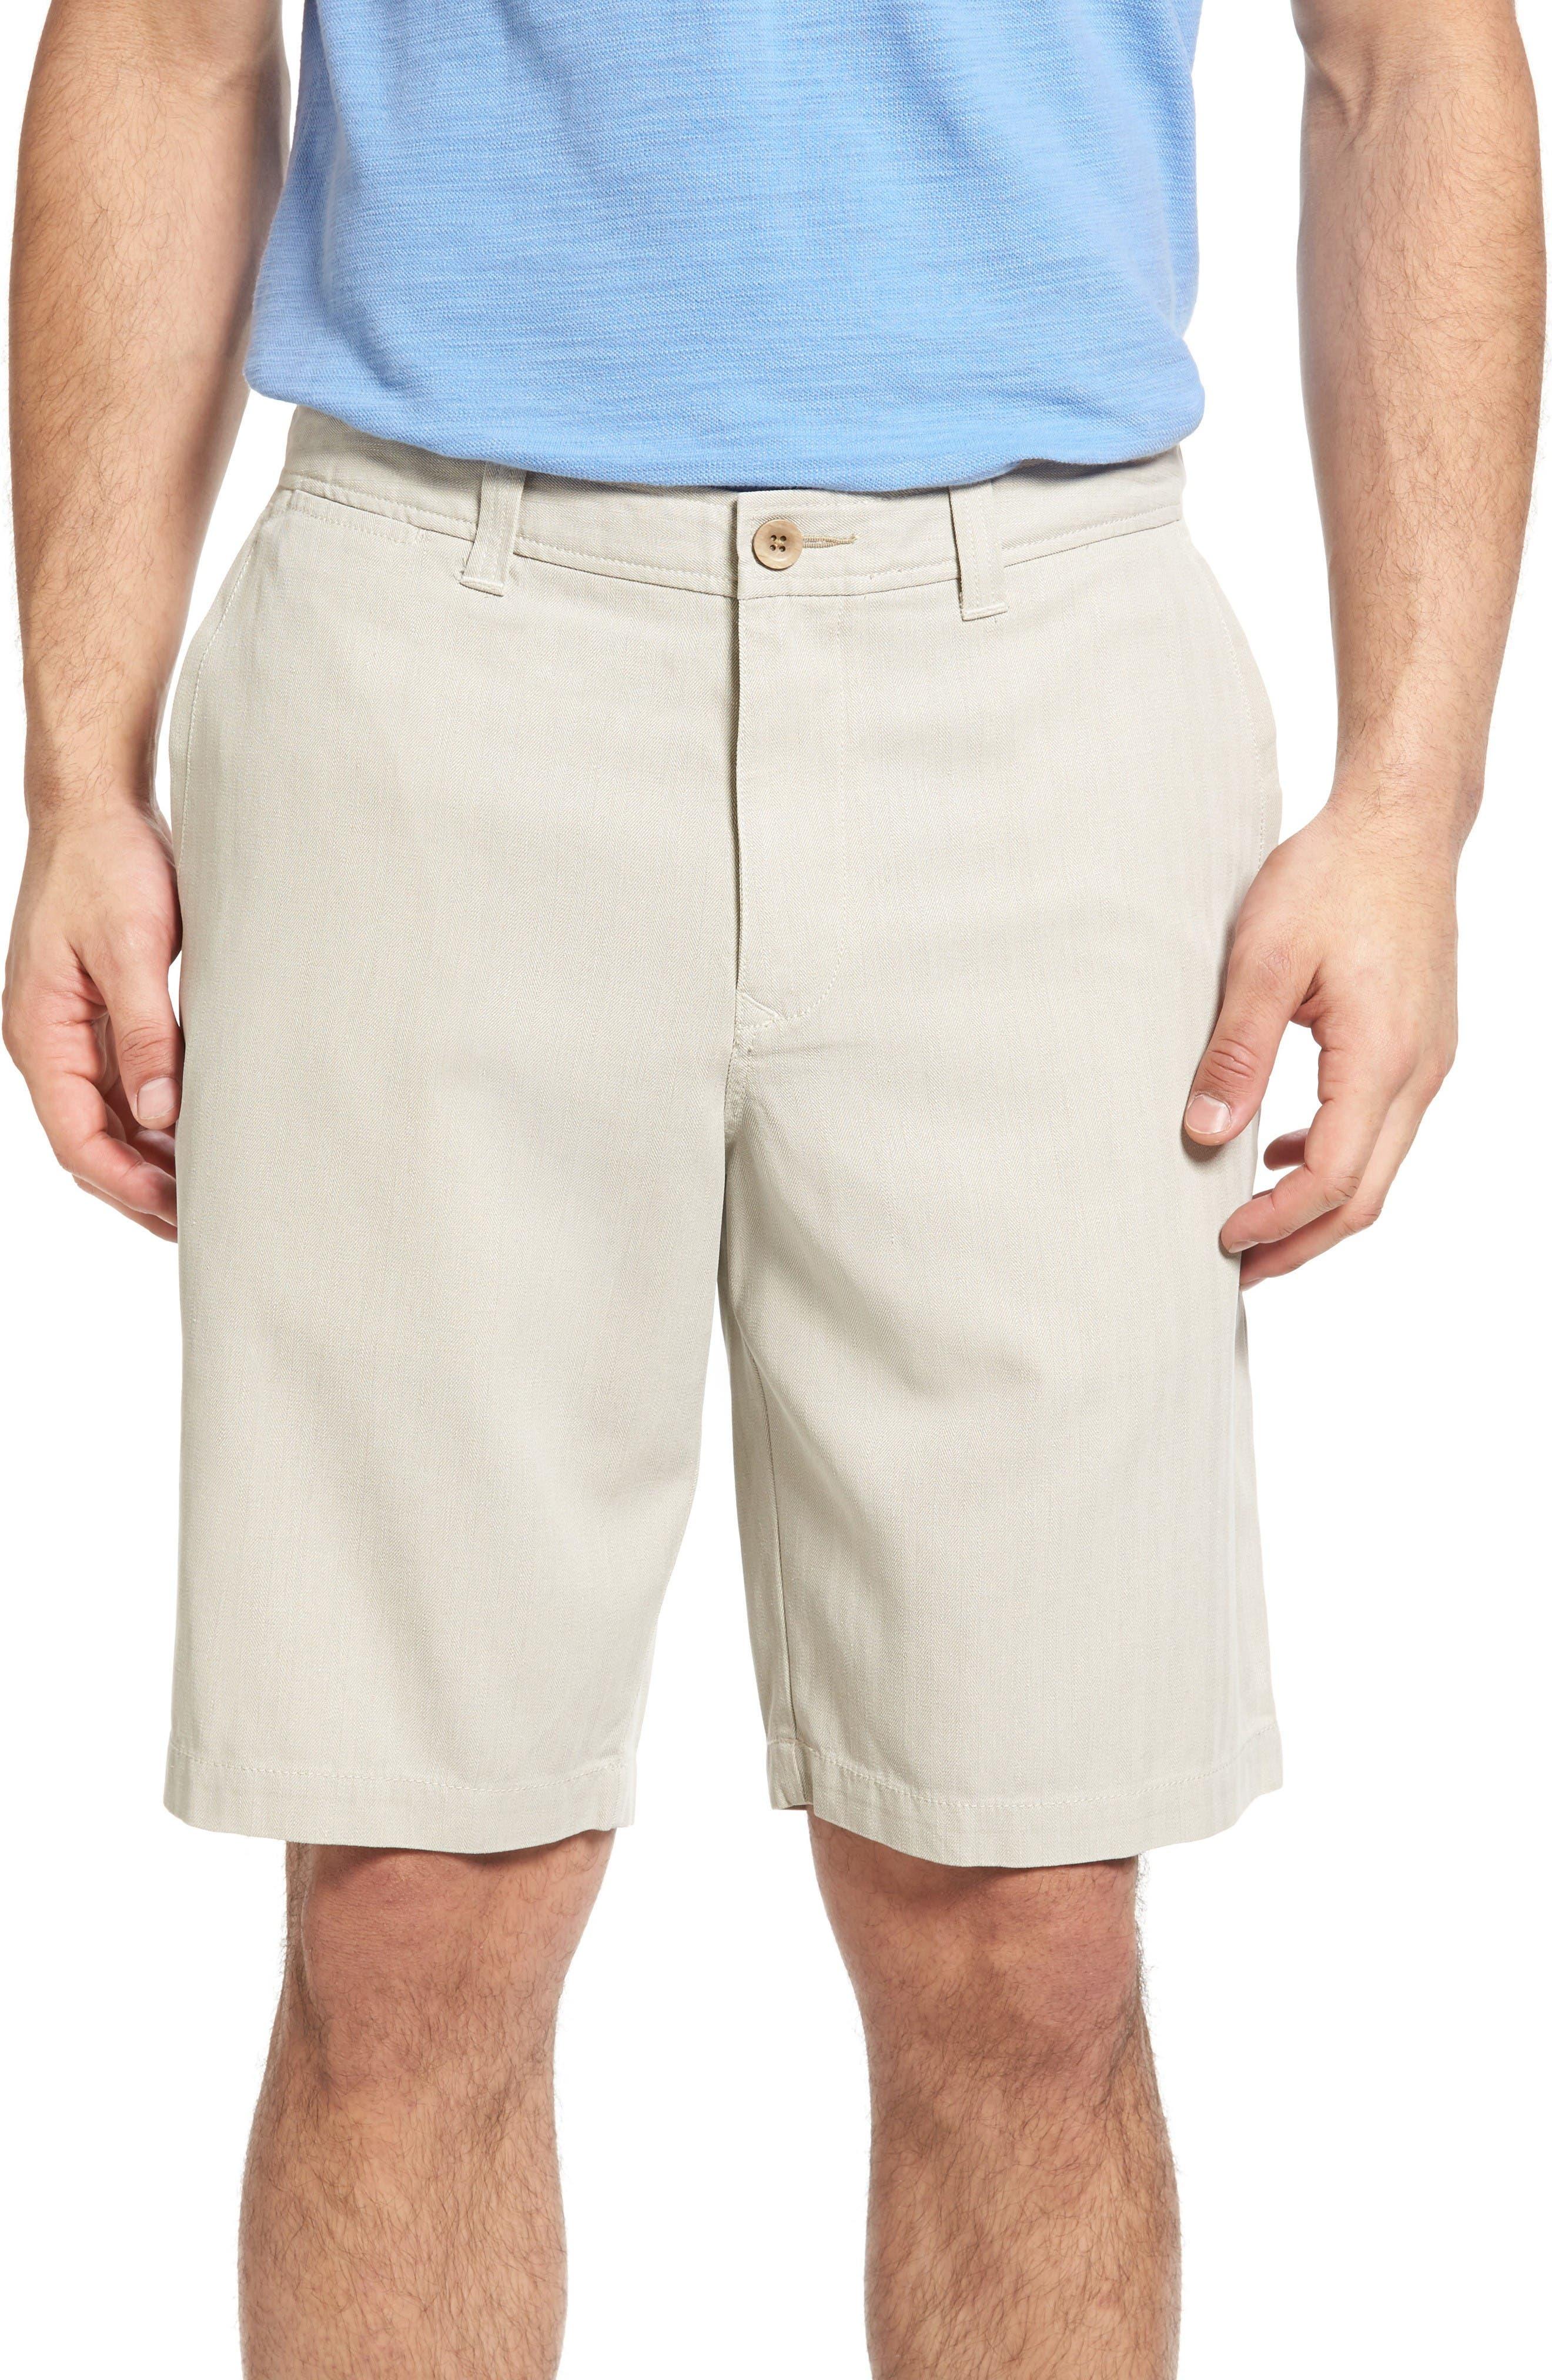 Havana Herringbone Silk Blend Chino Shorts,                             Main thumbnail 1, color,                             Khaki Sand